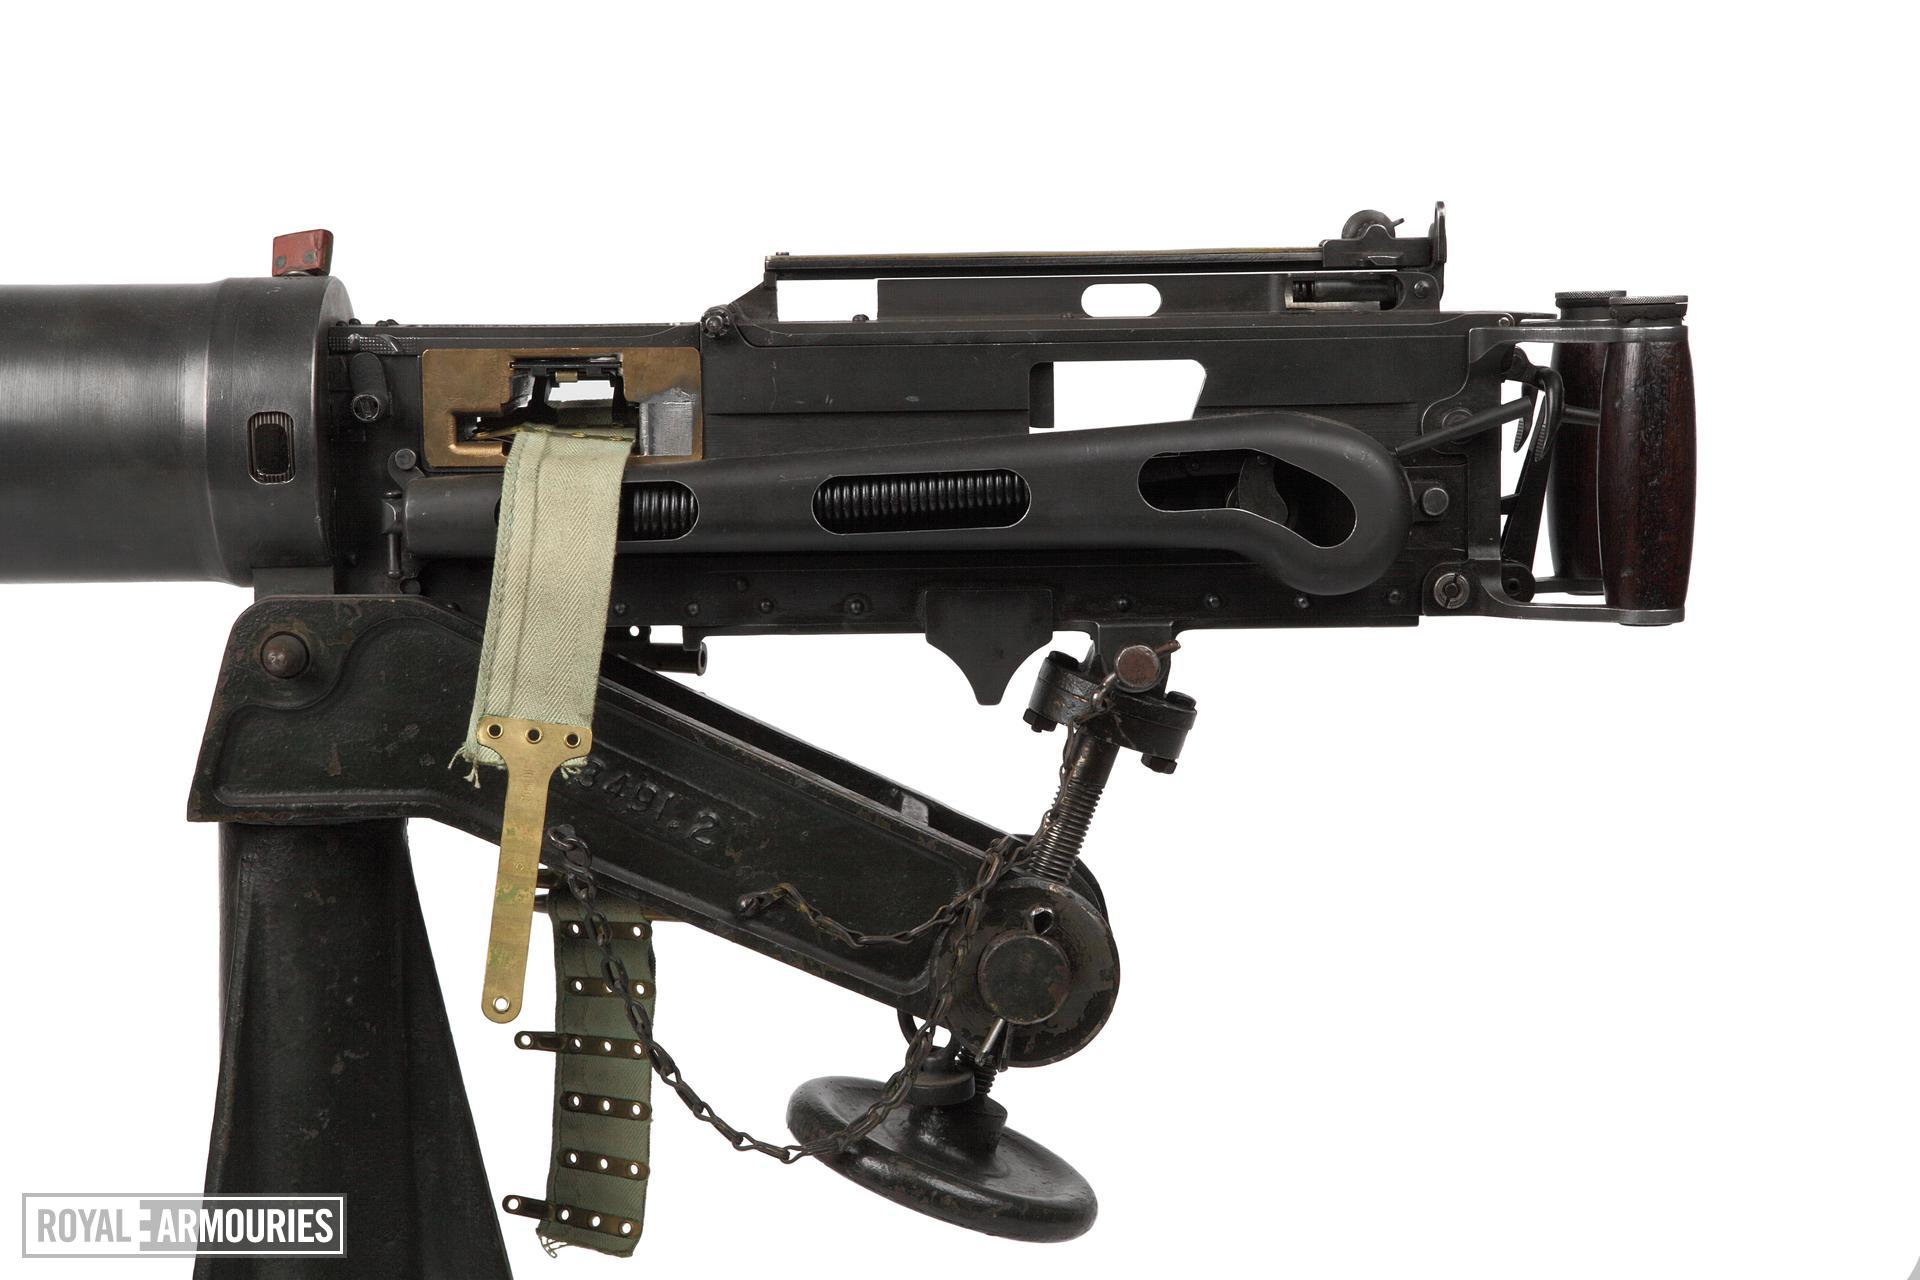 Vickers-Maxim machine gun, Mark I - Arms of the First World